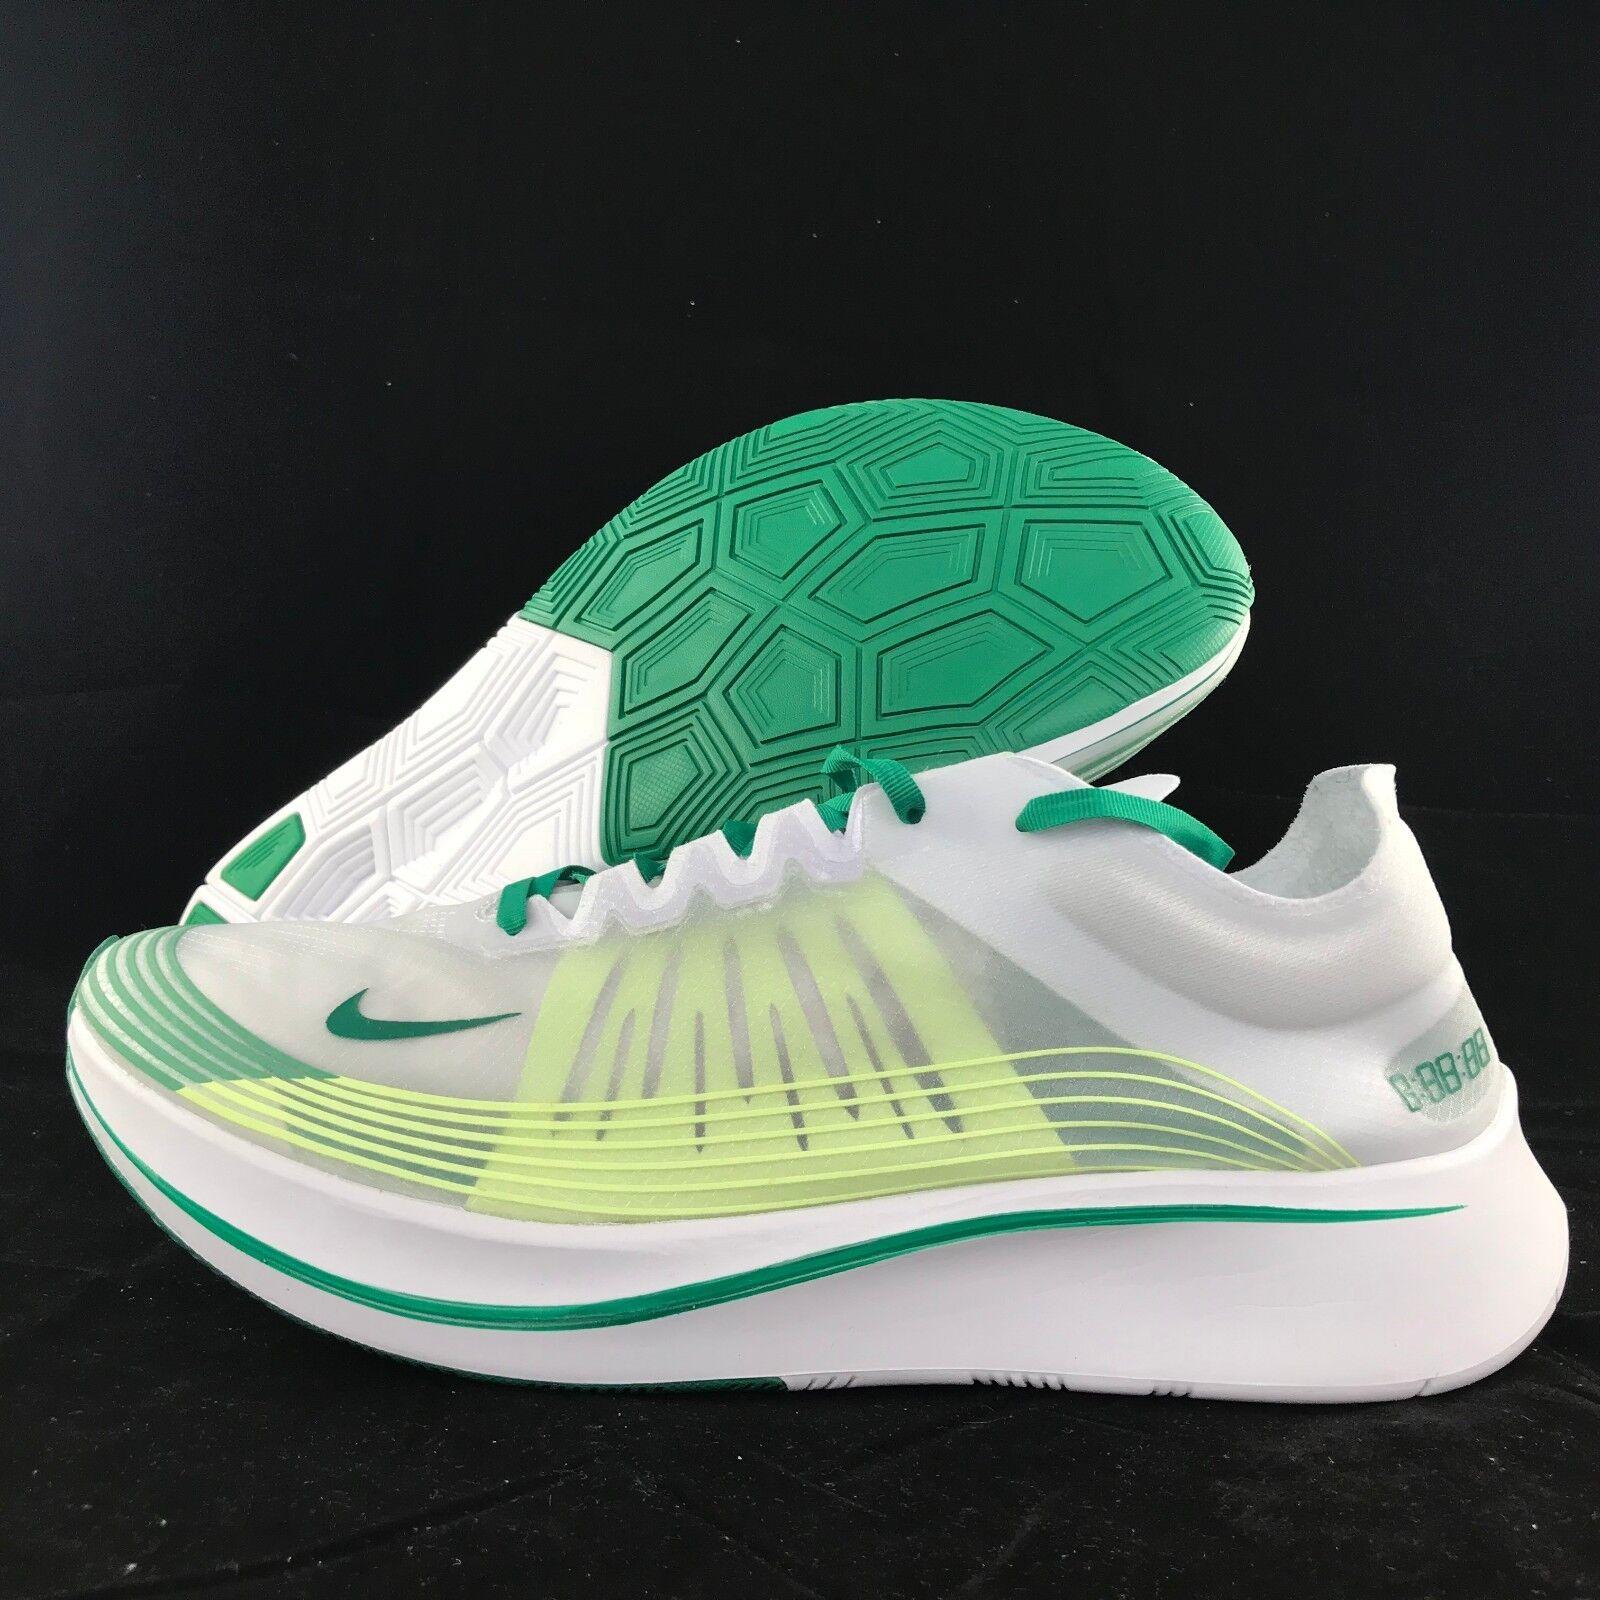 Nike Zoom Fly SP Green Hong Kong White Lucid Green SP Yellow AJ9282-101 Men's 10.5-13 NEW df08c0